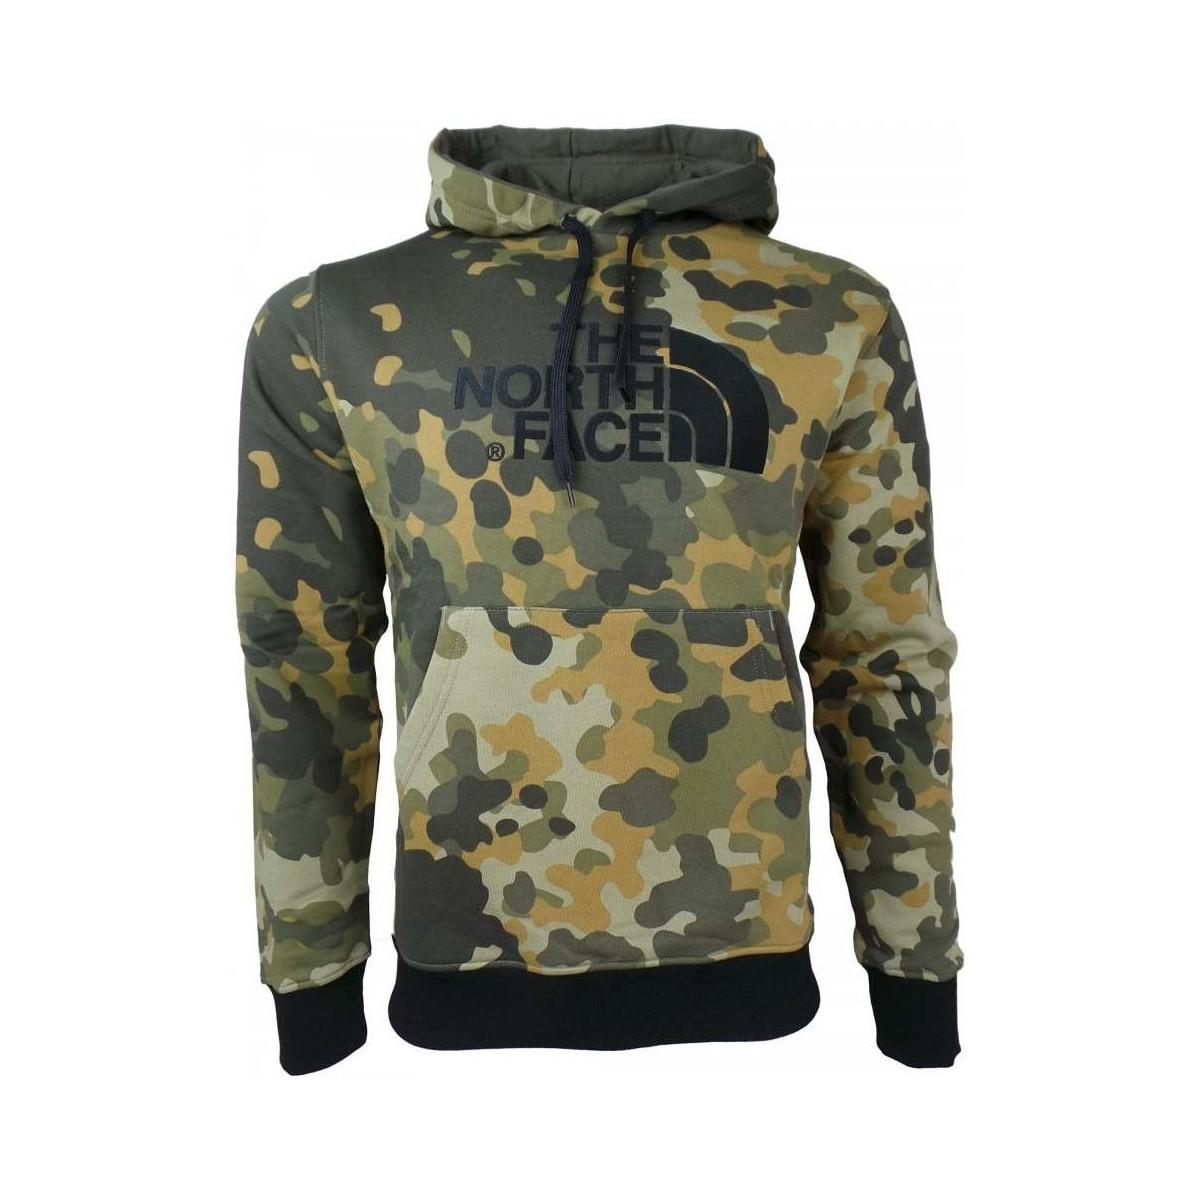 a347bfbef The North Face M Drew Peak Plv Hood Men's Sweatshirt In Green in ...